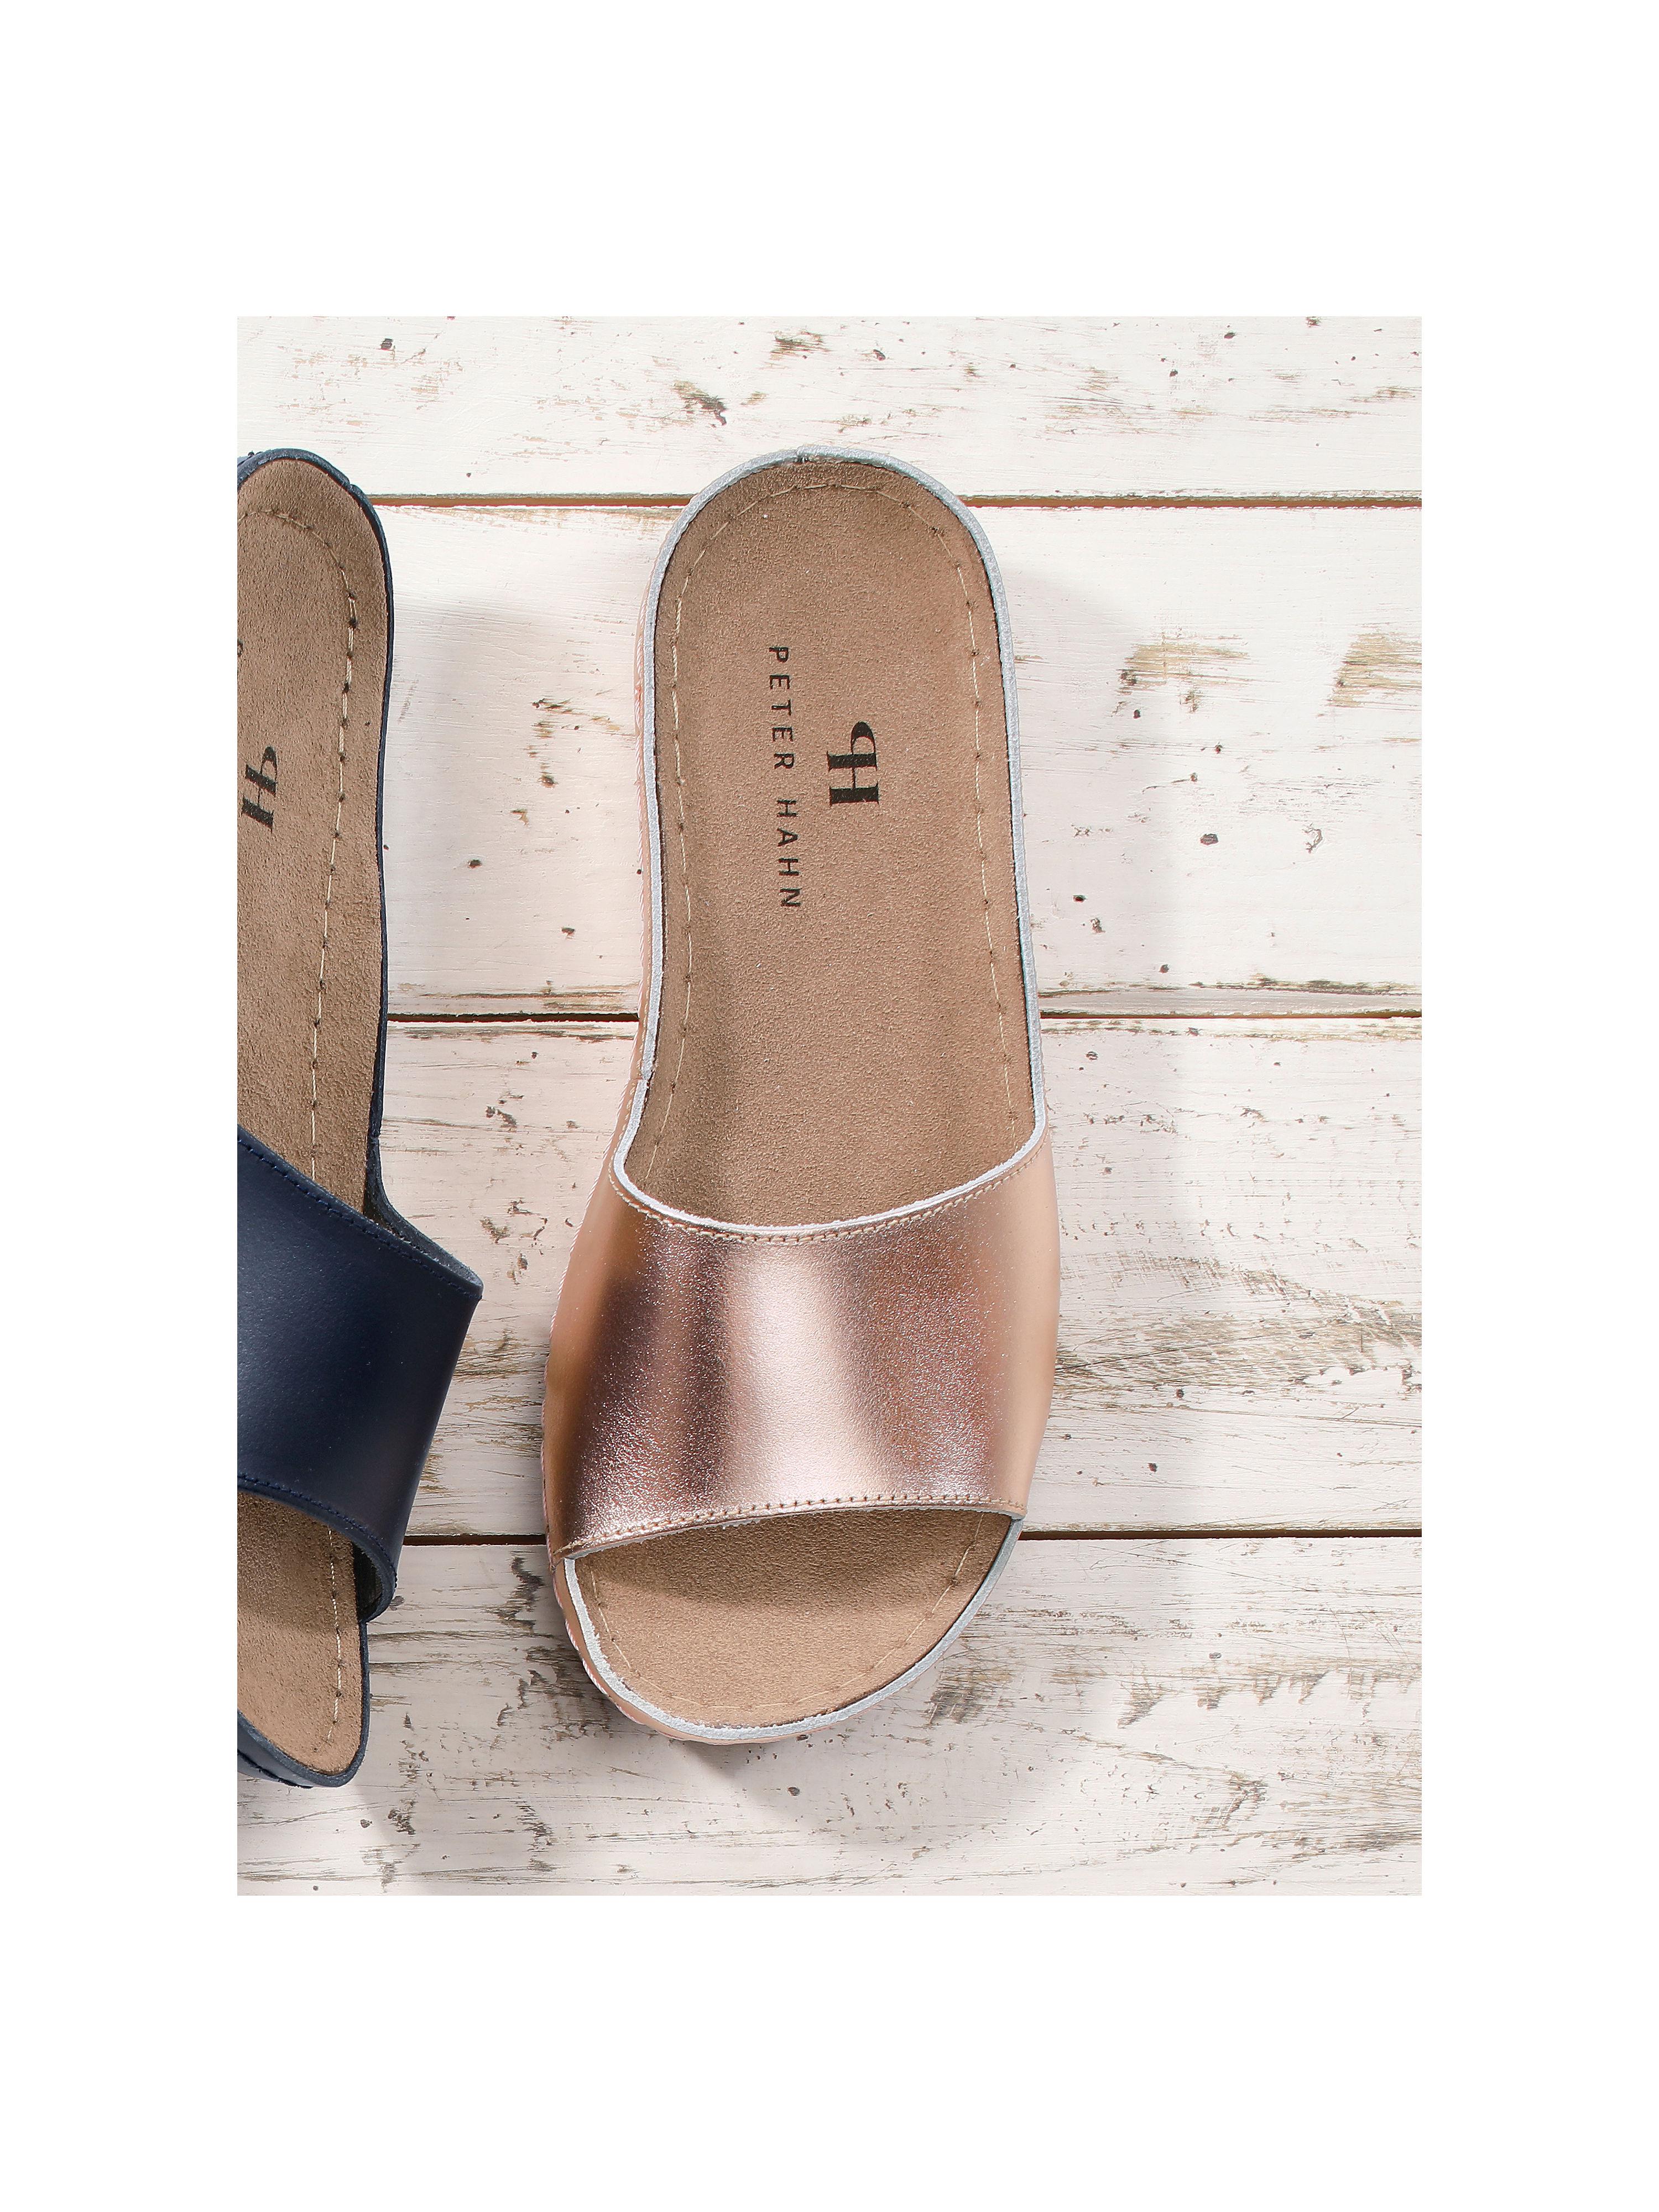 Peter Hahn - Pantolette aus 100% Qualität Leder - Rosegold-Metallic Gute Qualität 100% beliebte Schuhe 3ca29b